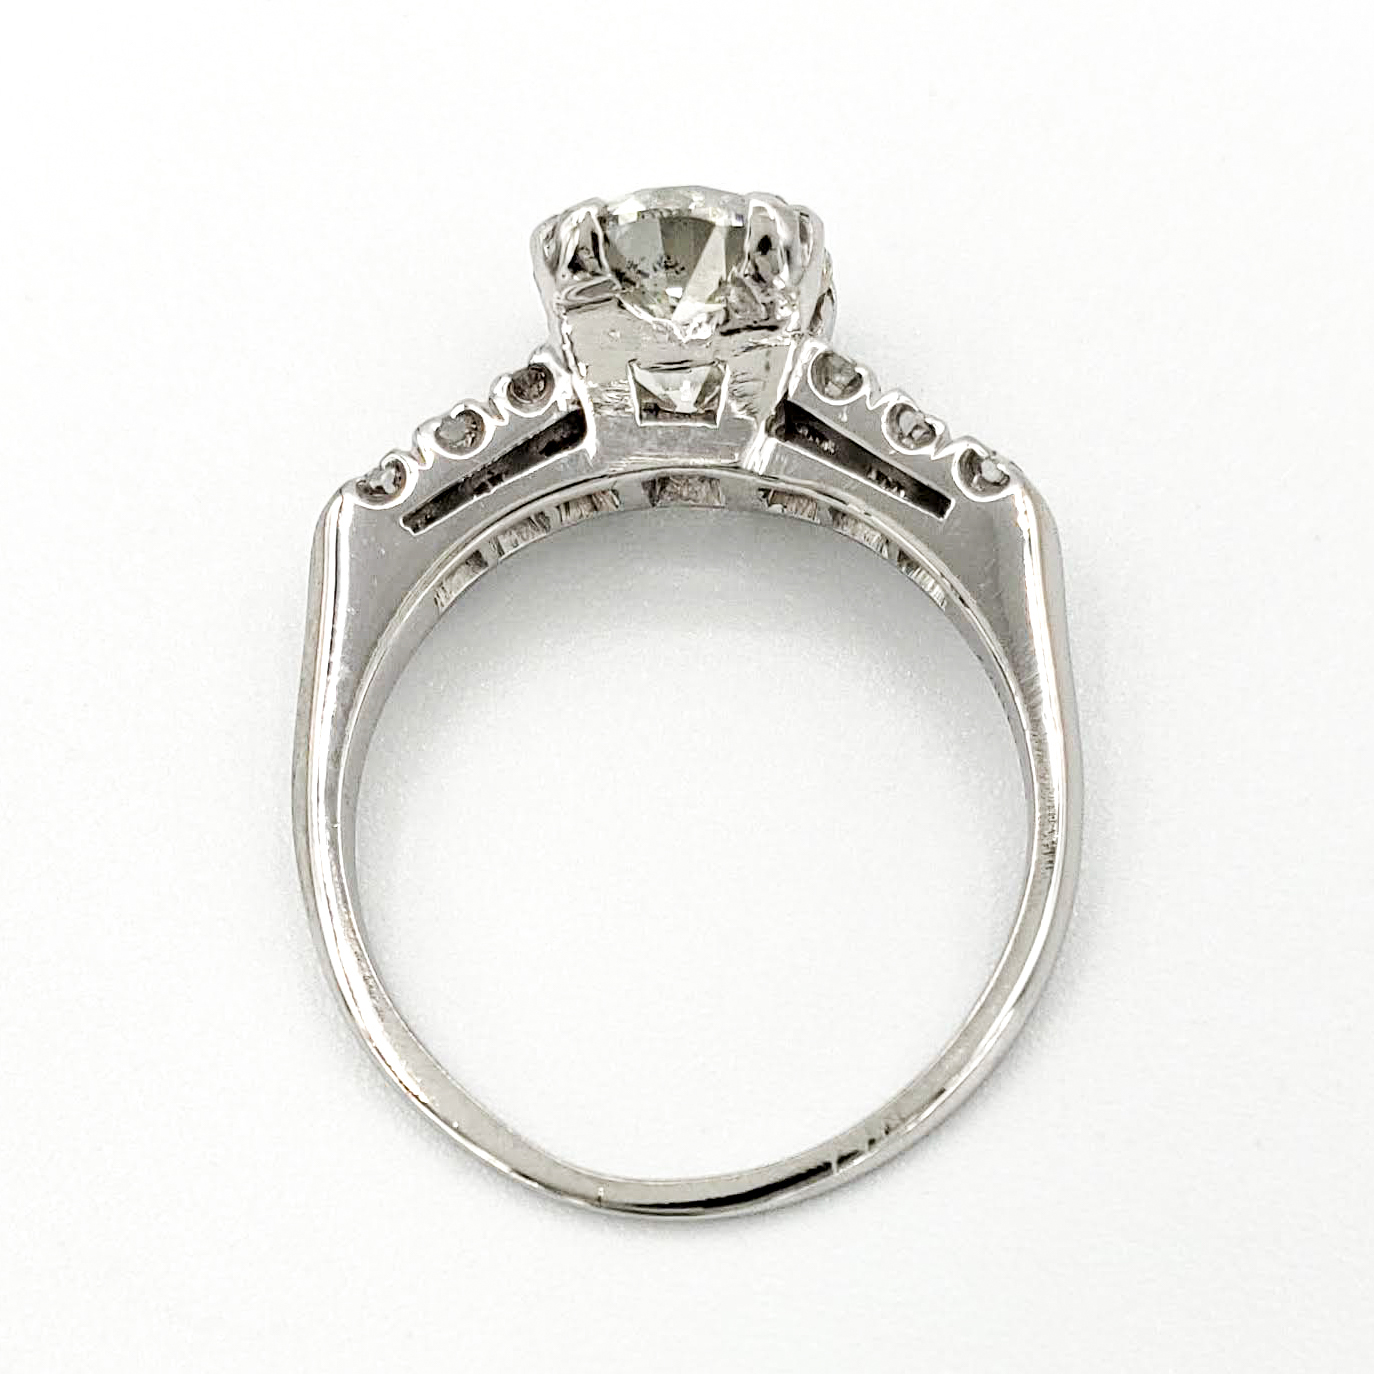 vintage-platinum-engagement-ring-with-1-31-carat-old-european-cut-diamond-egl-j-si2